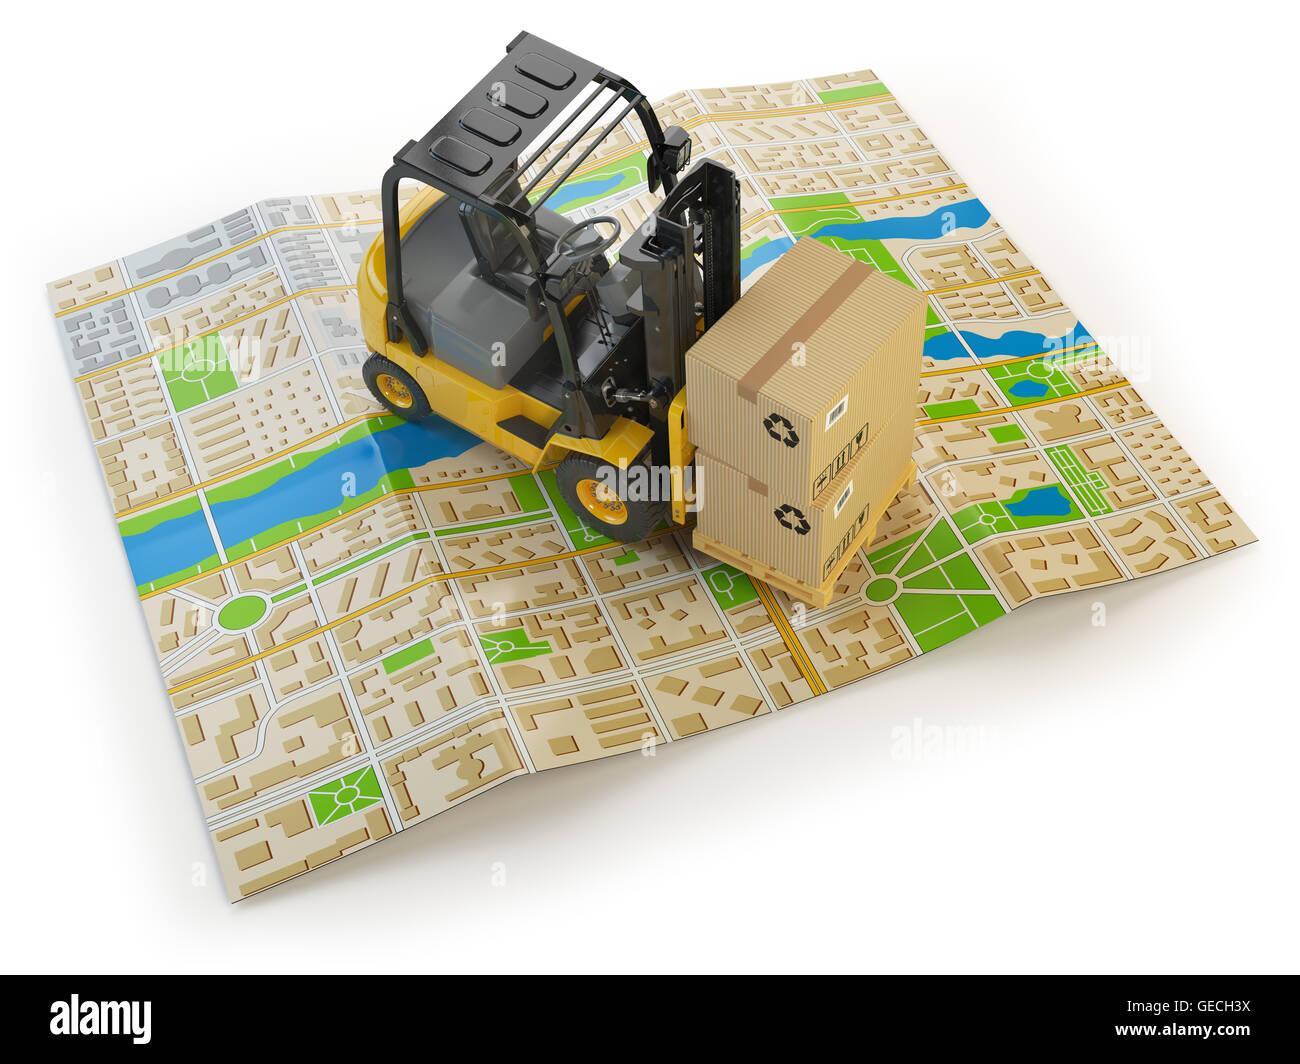 Gabelstapler mit Kartons auf dem Stadtplan isoliert auf weiss.  Fracht-Lieferung-Konzept. 3D illustration Stockbild